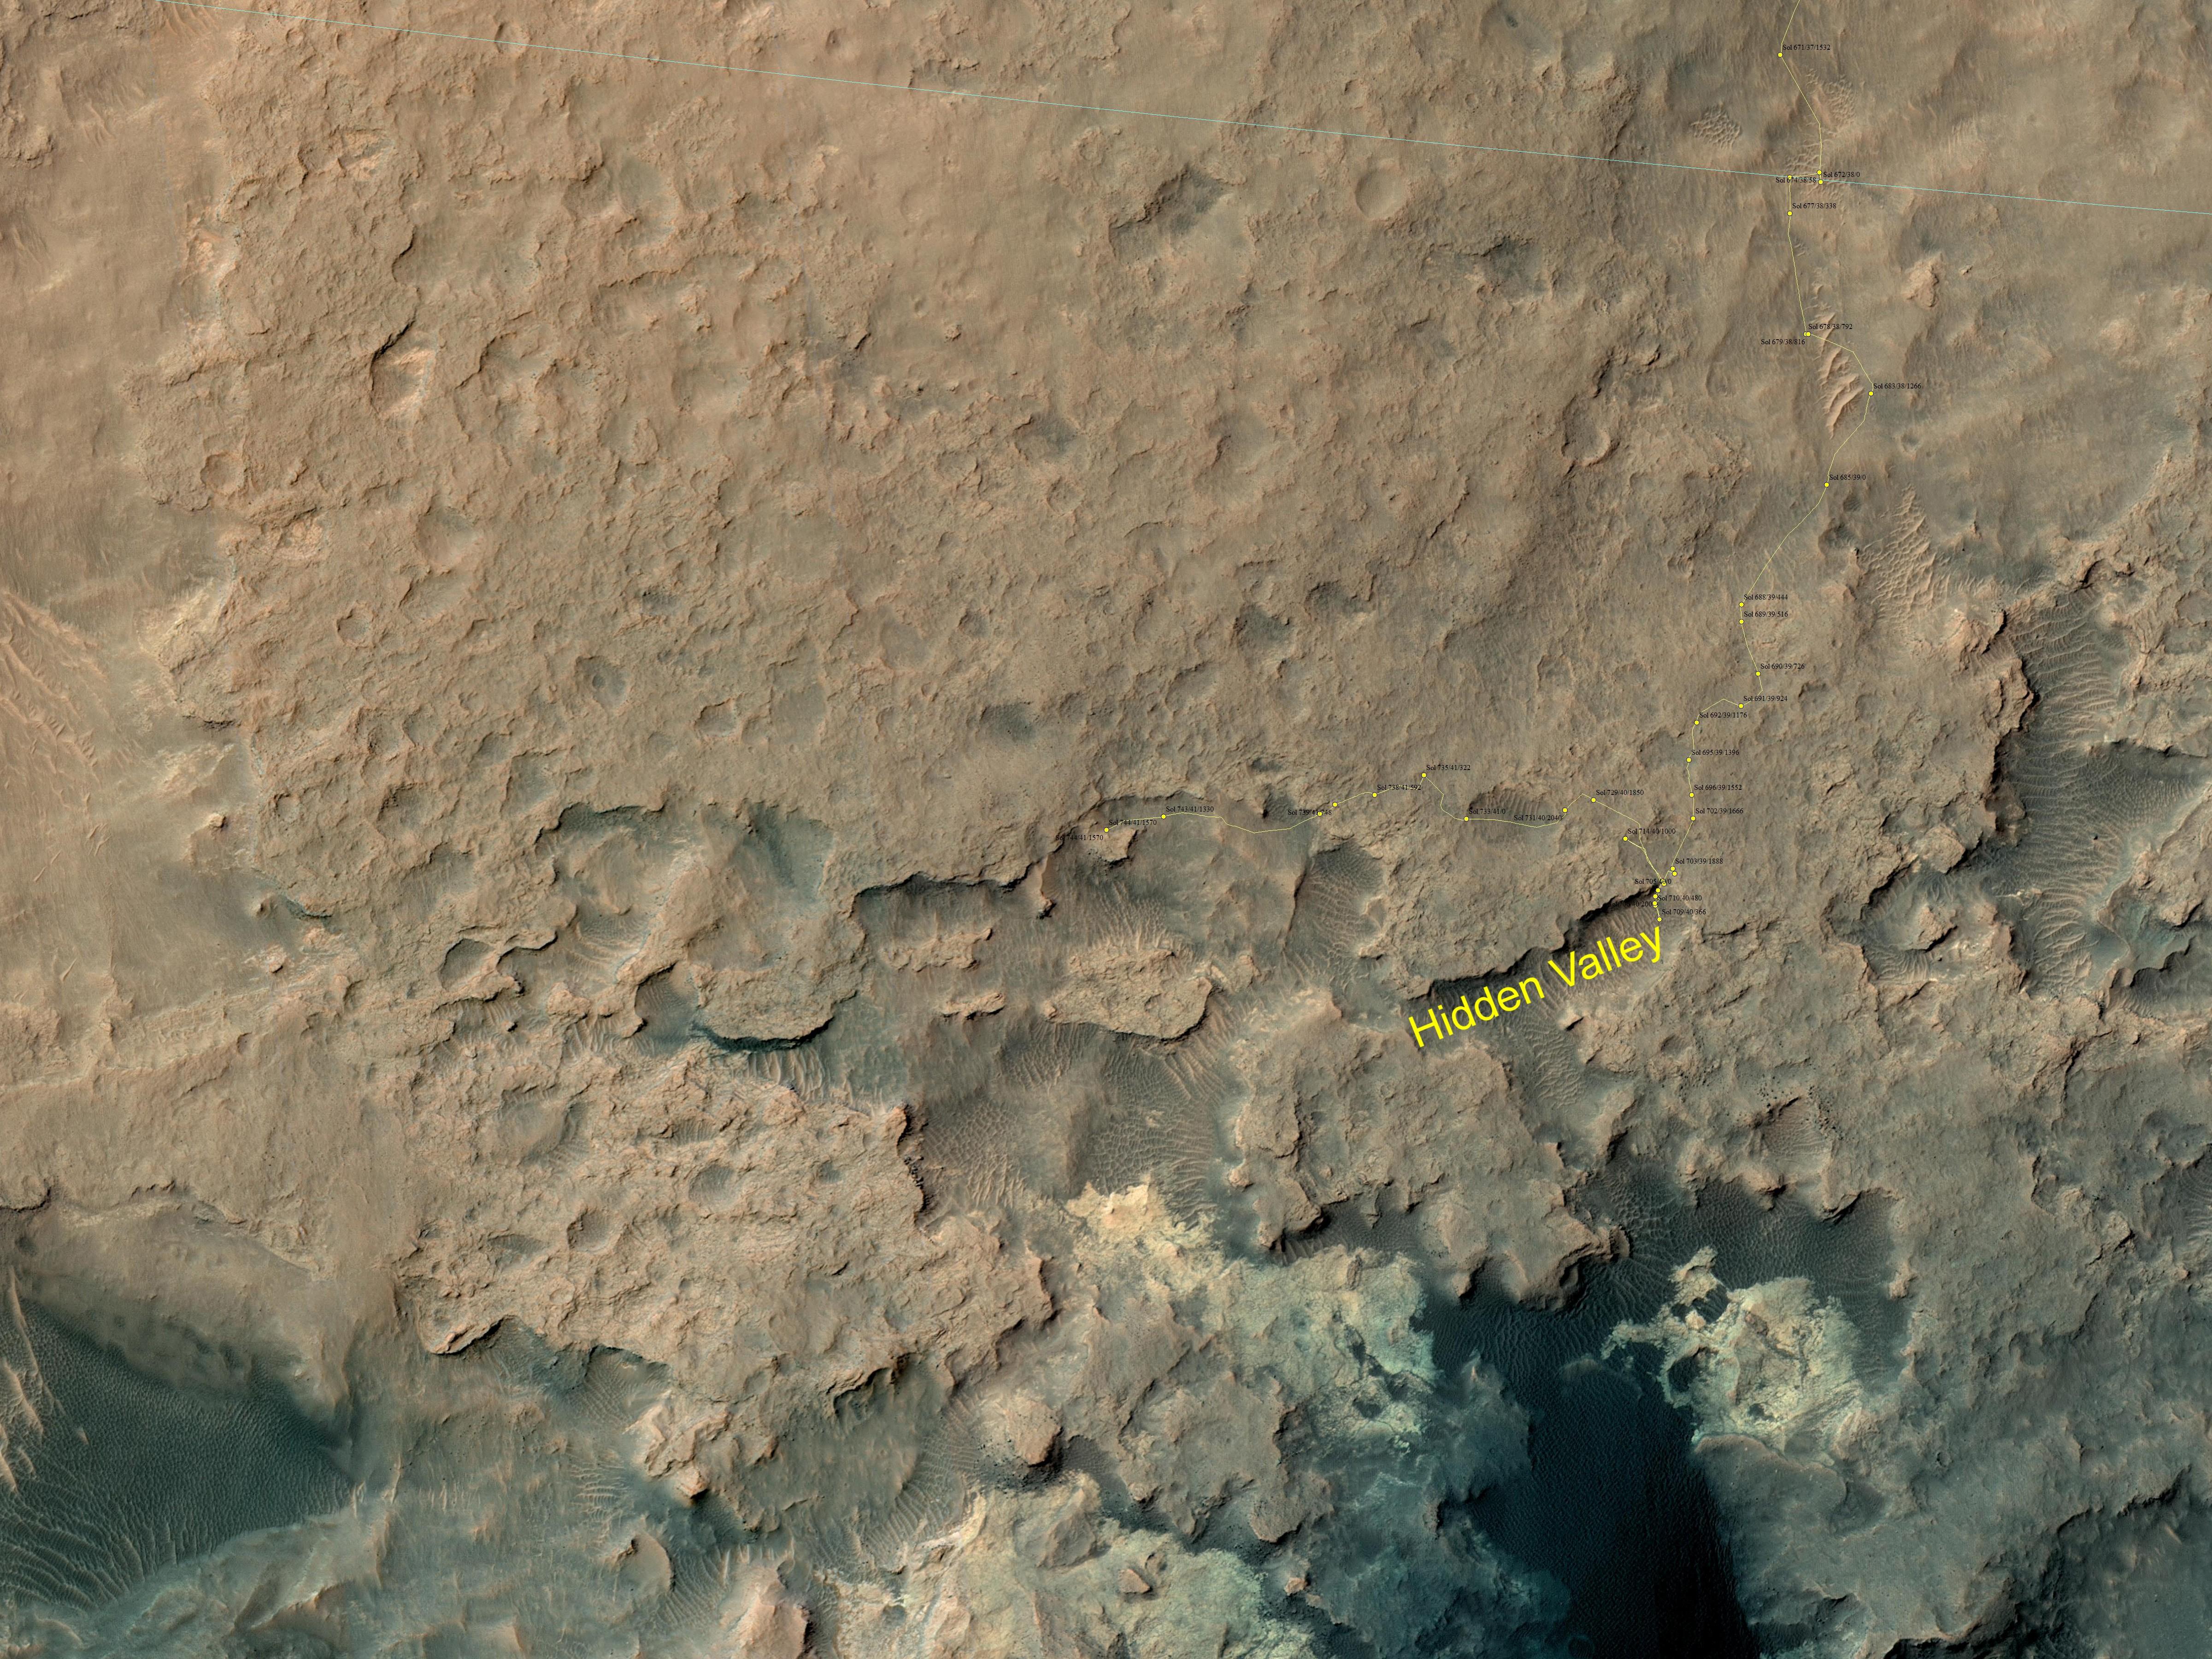 curiosity_location_sol0744-full renseigné